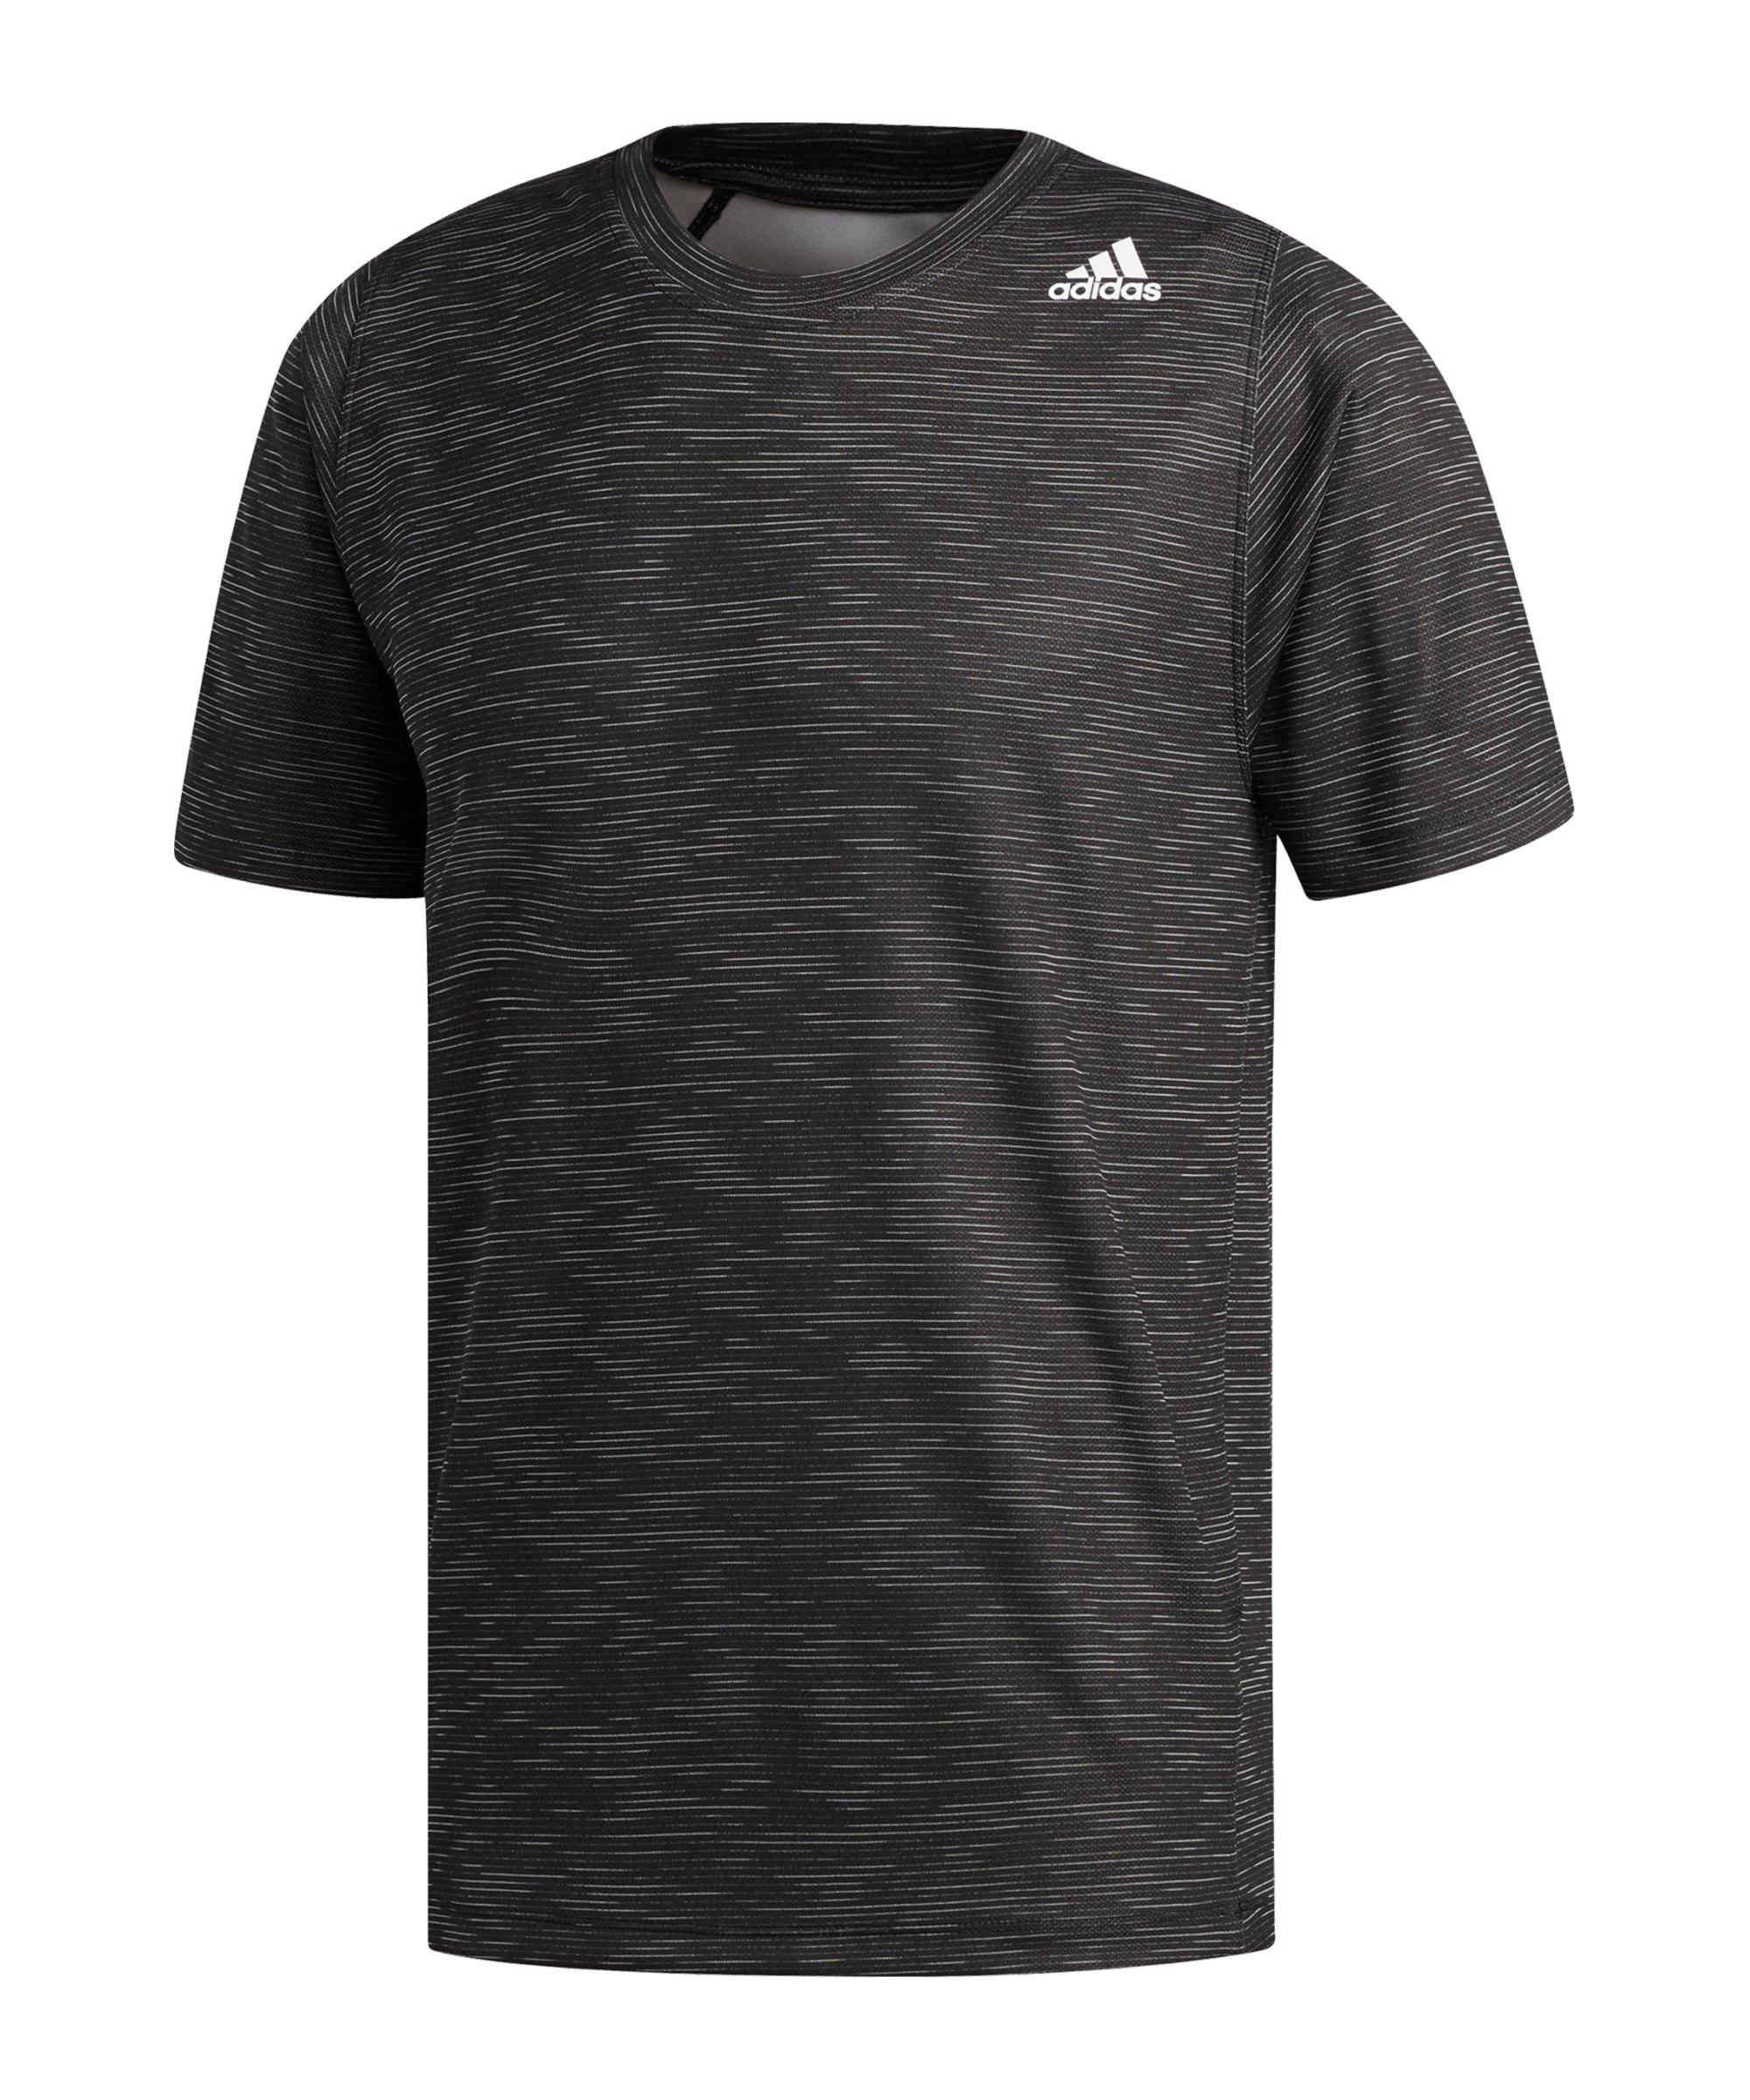 adidas FreeLift Tech T-Shirt Grau - schwarz